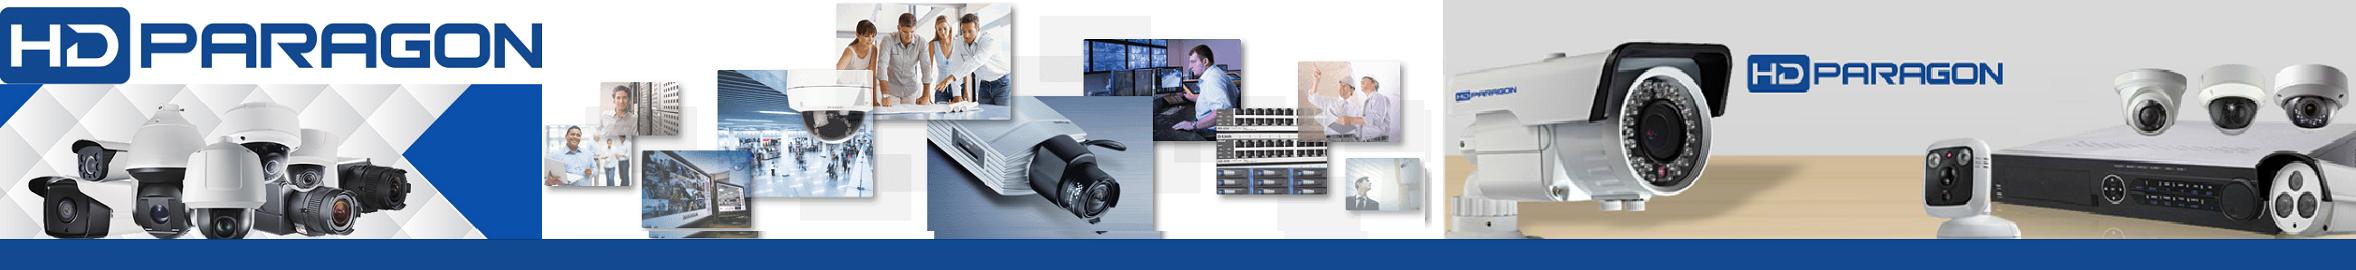 Camera TVI HDParagon